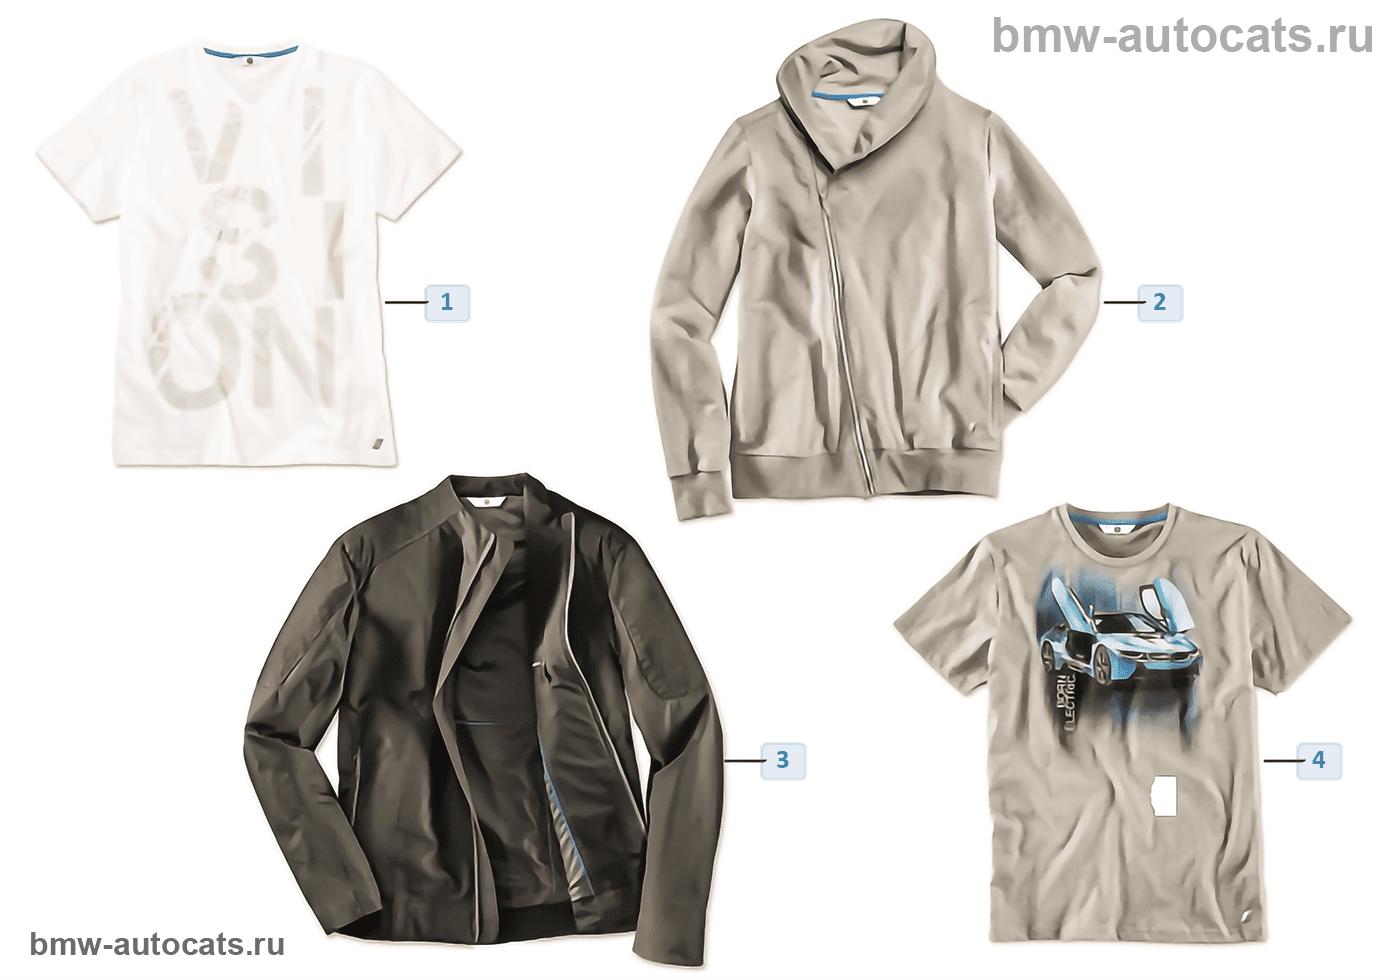 BMW i Coll. — Мужская одежда 16-18